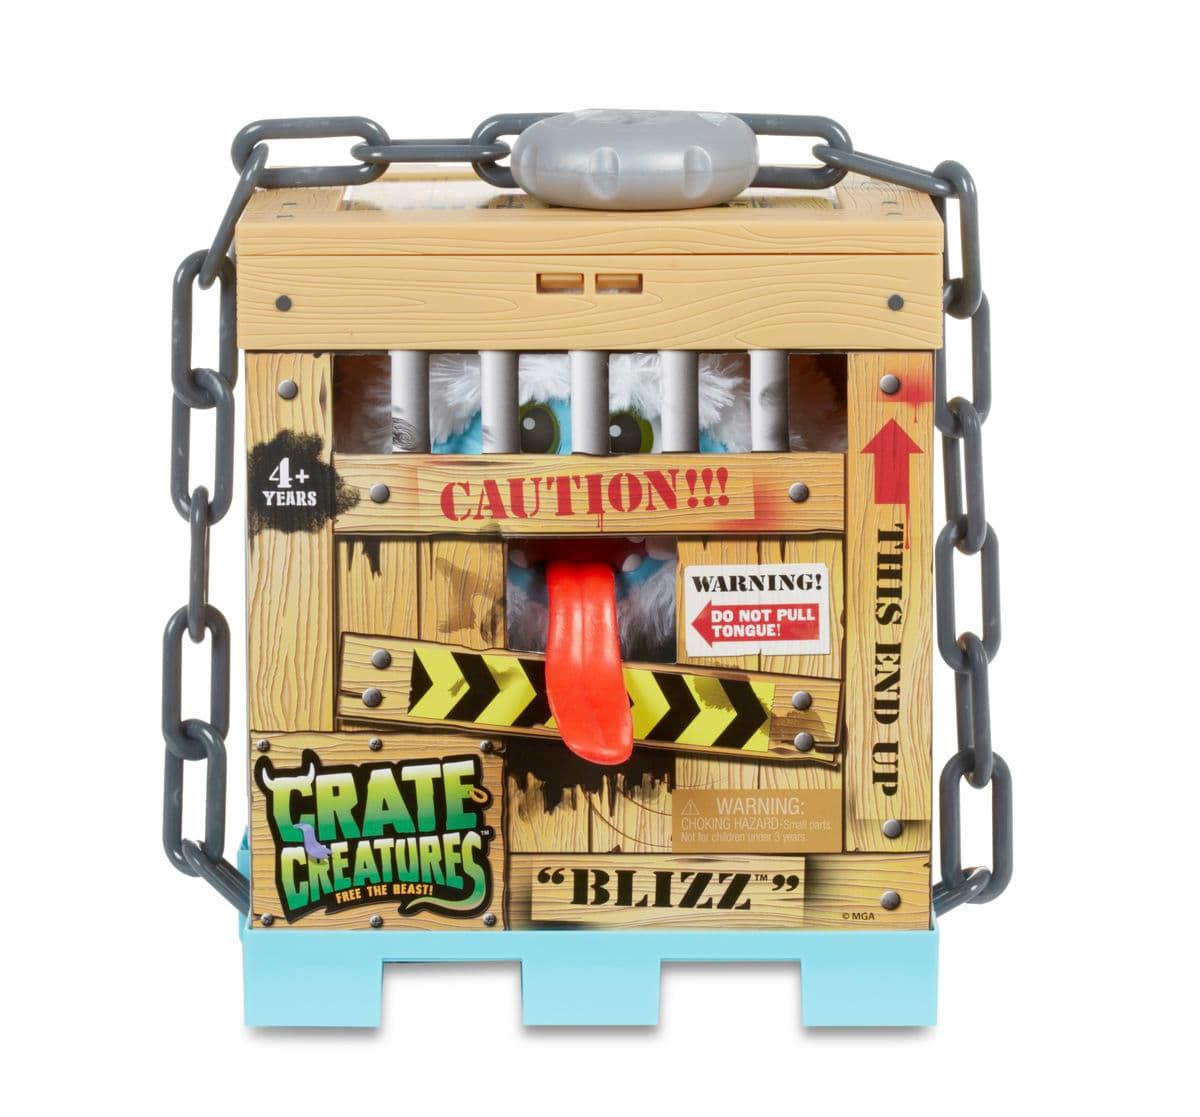 crate creatures surprise-blizz